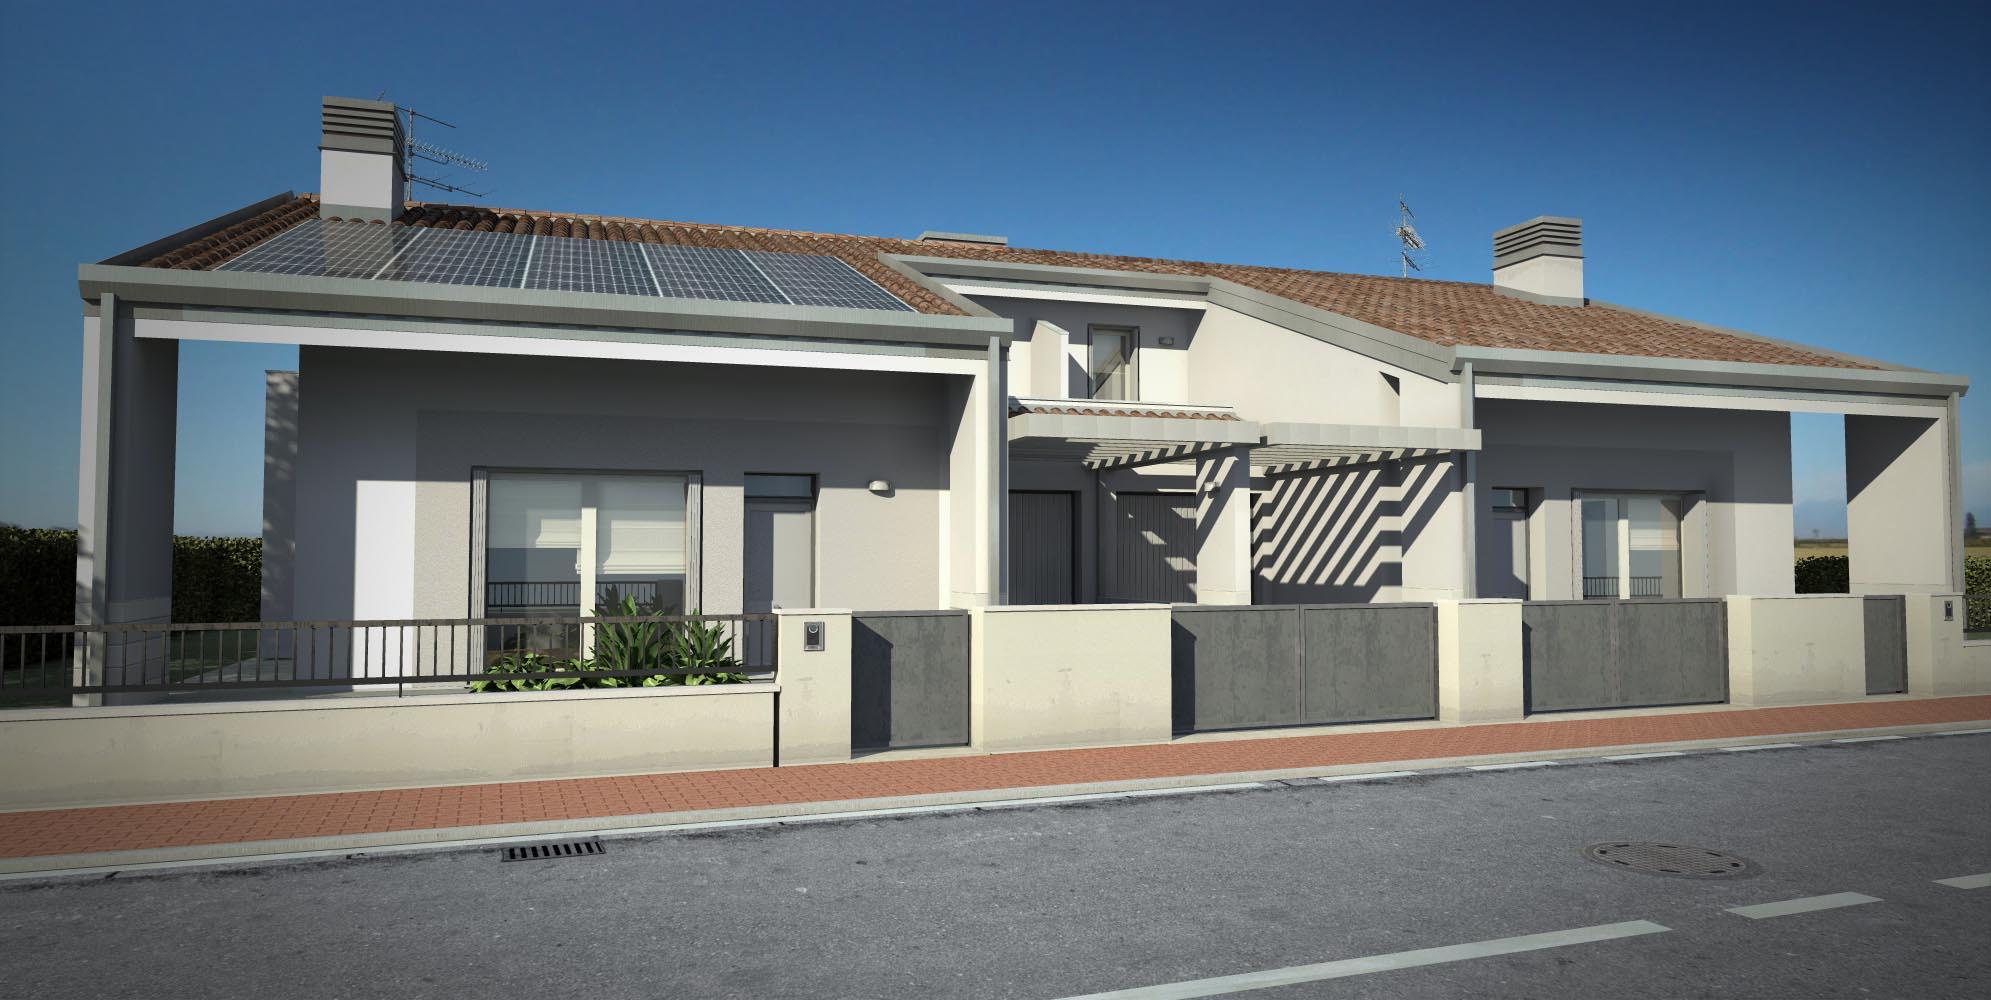 Progetti case moderne porticato moderno n with progetti for Progetti ville bifamiliari moderne